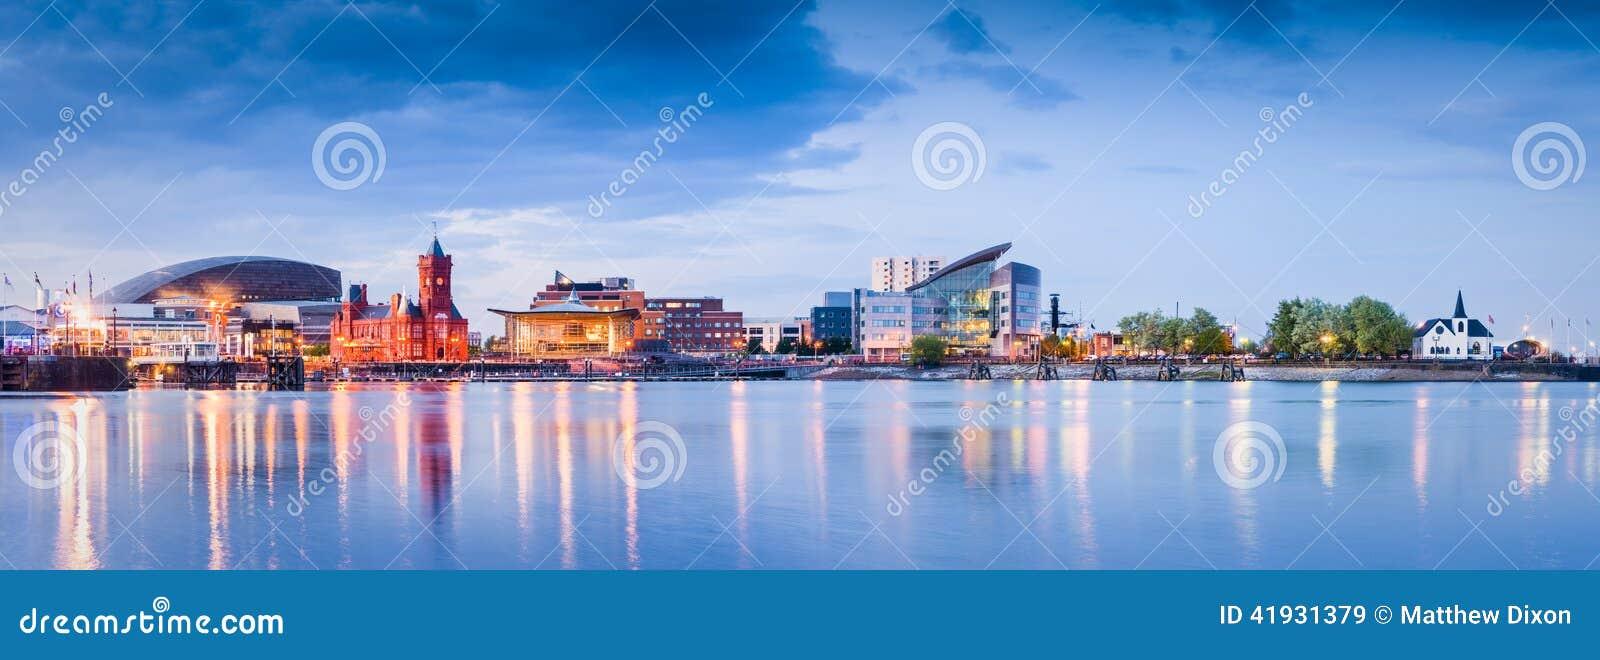 De Baaicityscape van Cardiff